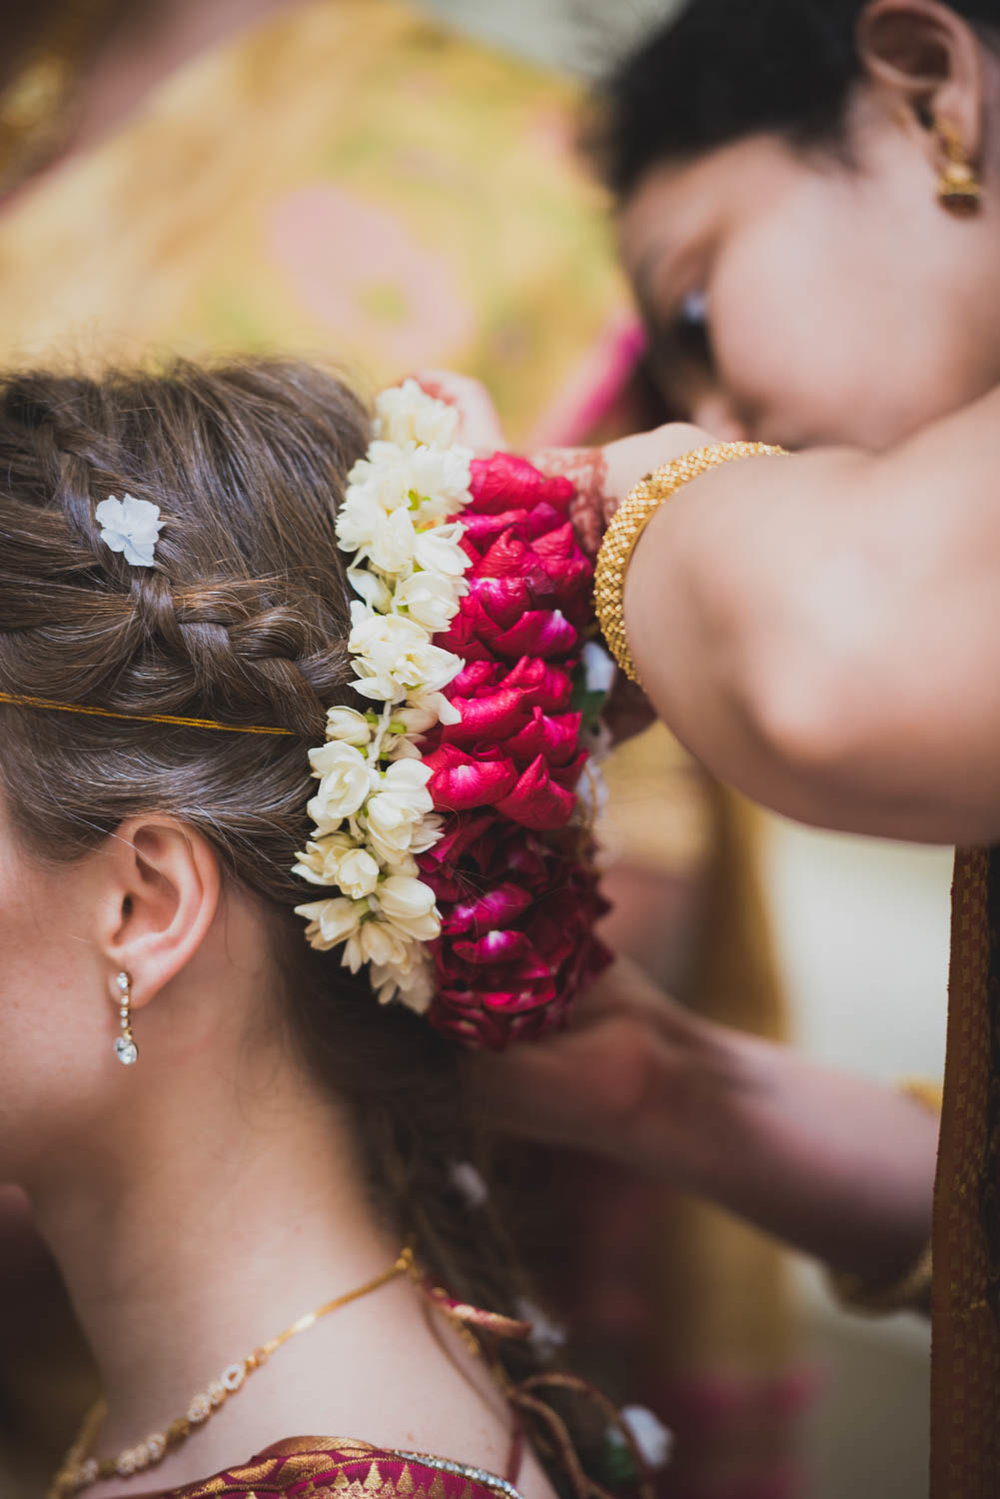 ecaterina-chandu-indian-wedding5.jpg